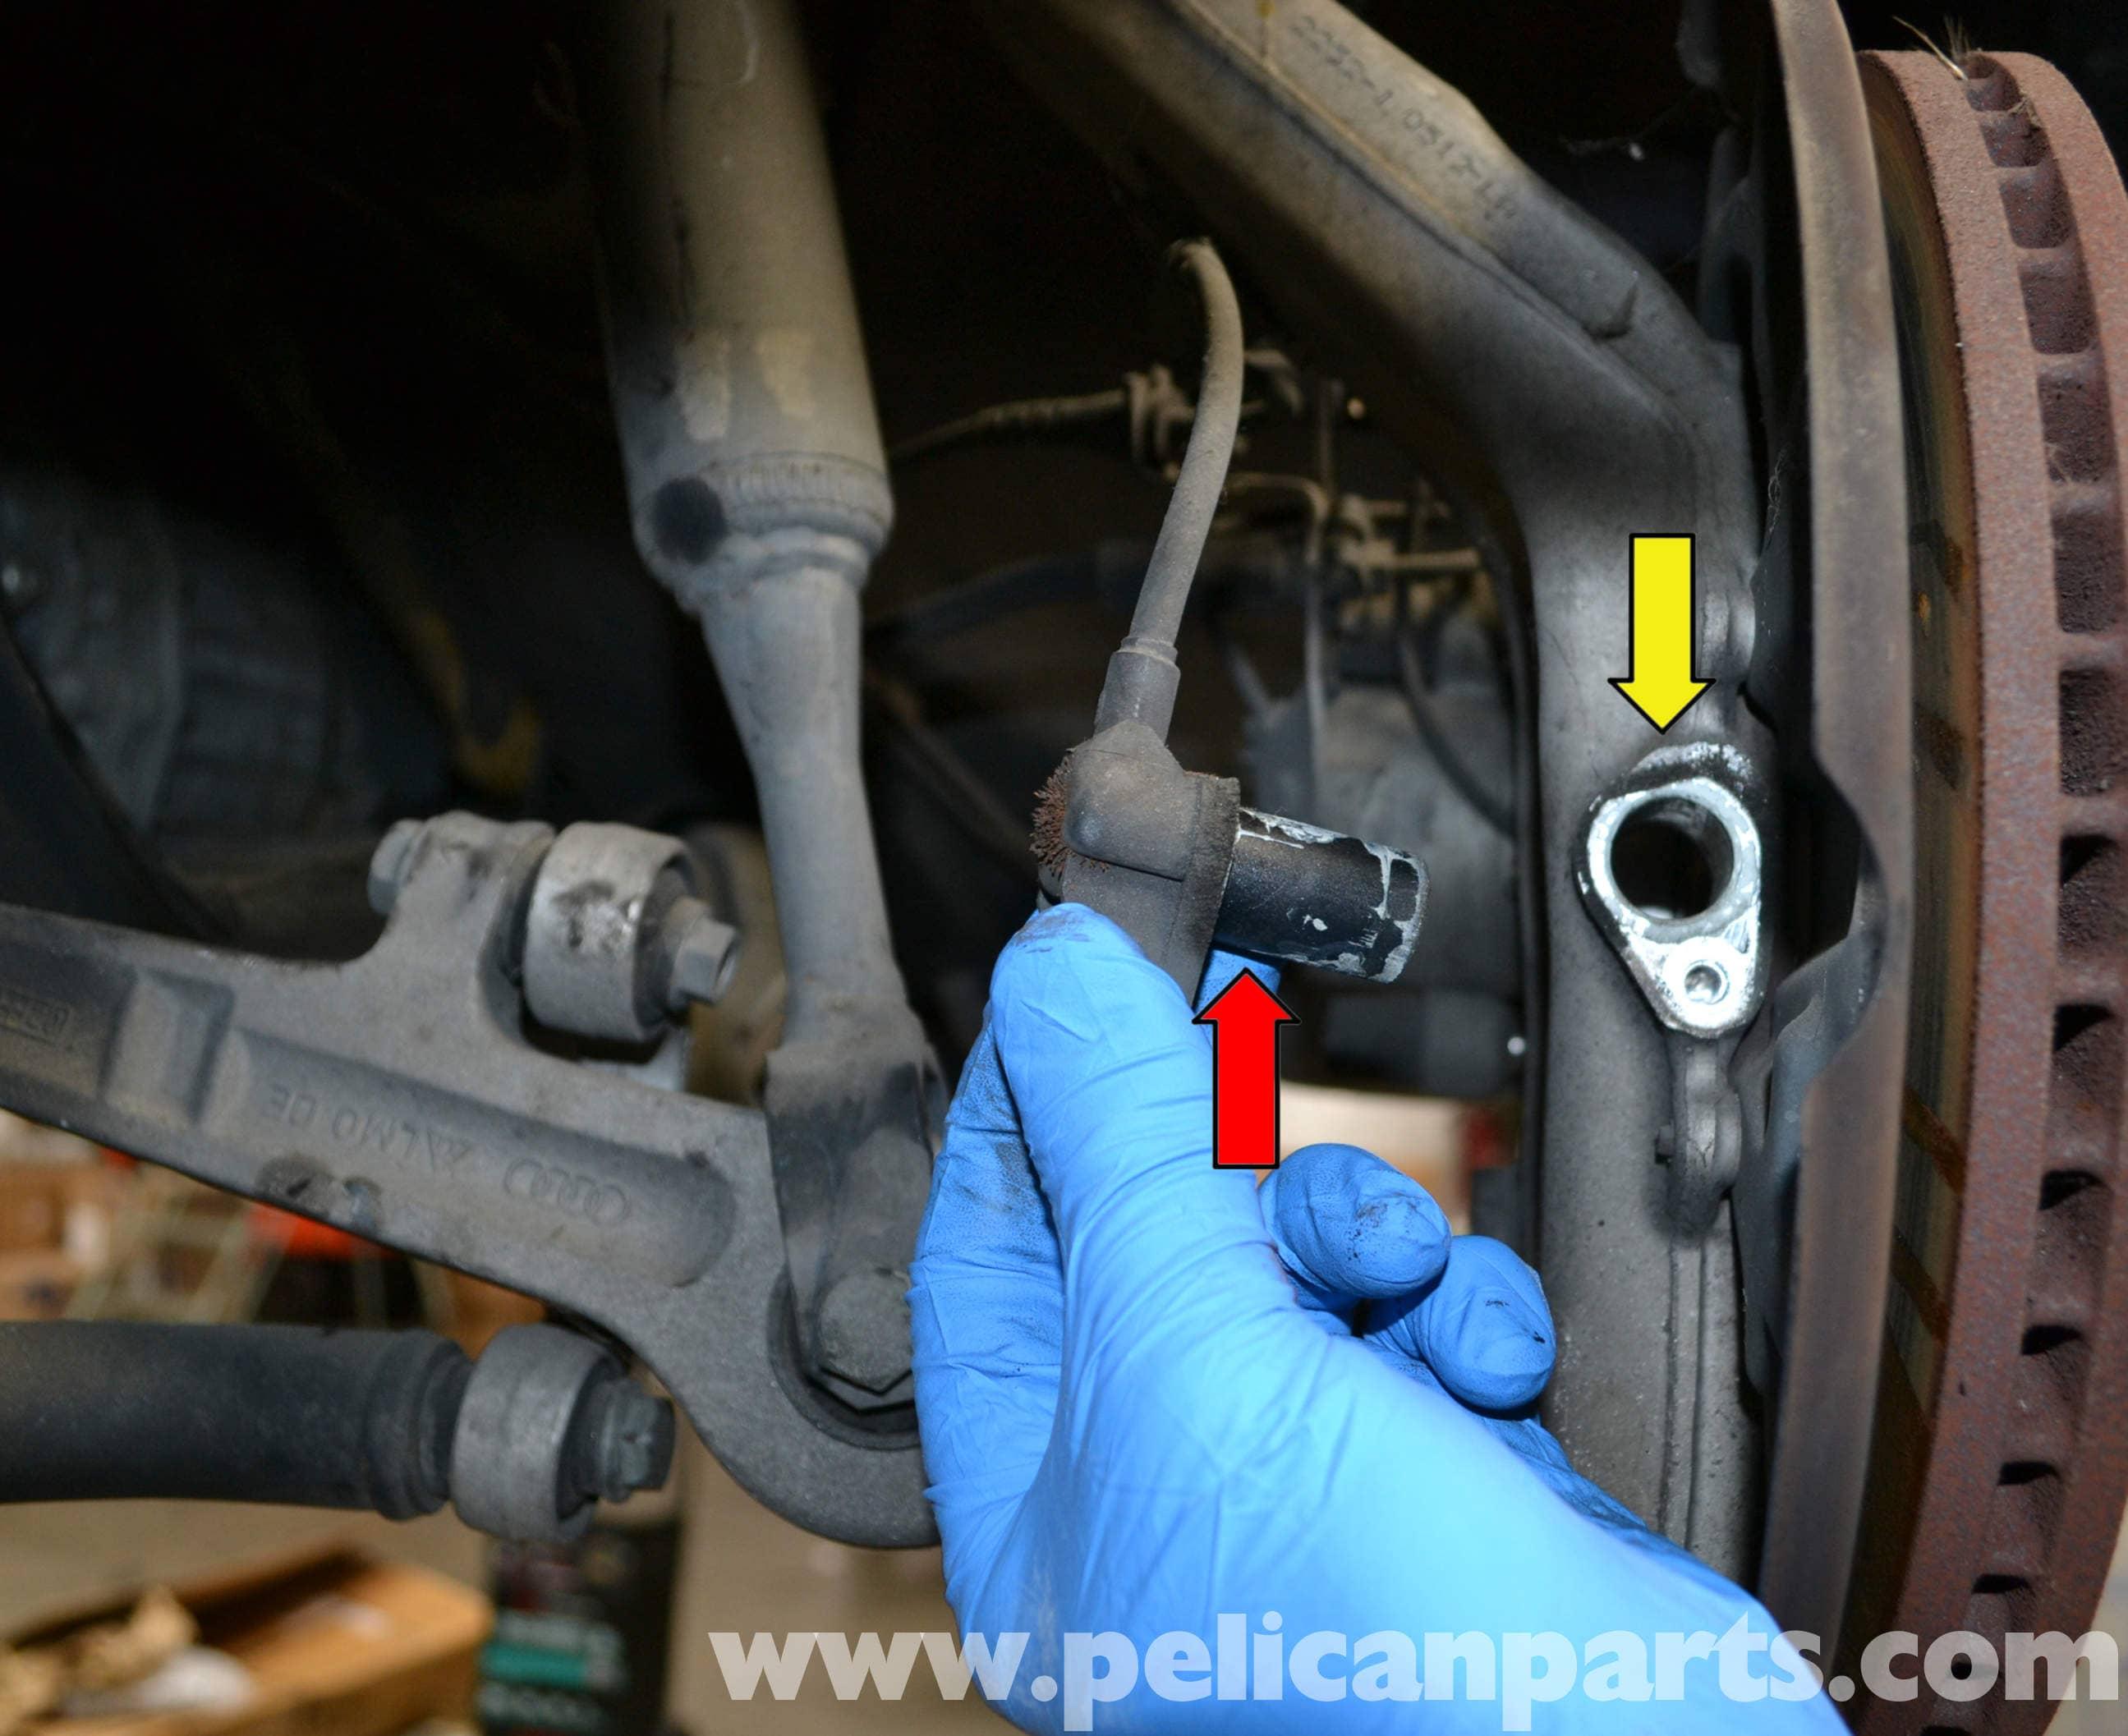 1999 Jeep Cherokee Crankshaft Sensor Wiring Diagram Audi A4 B6 Abs Wheel Speed Sensor Replacement 2002 2008